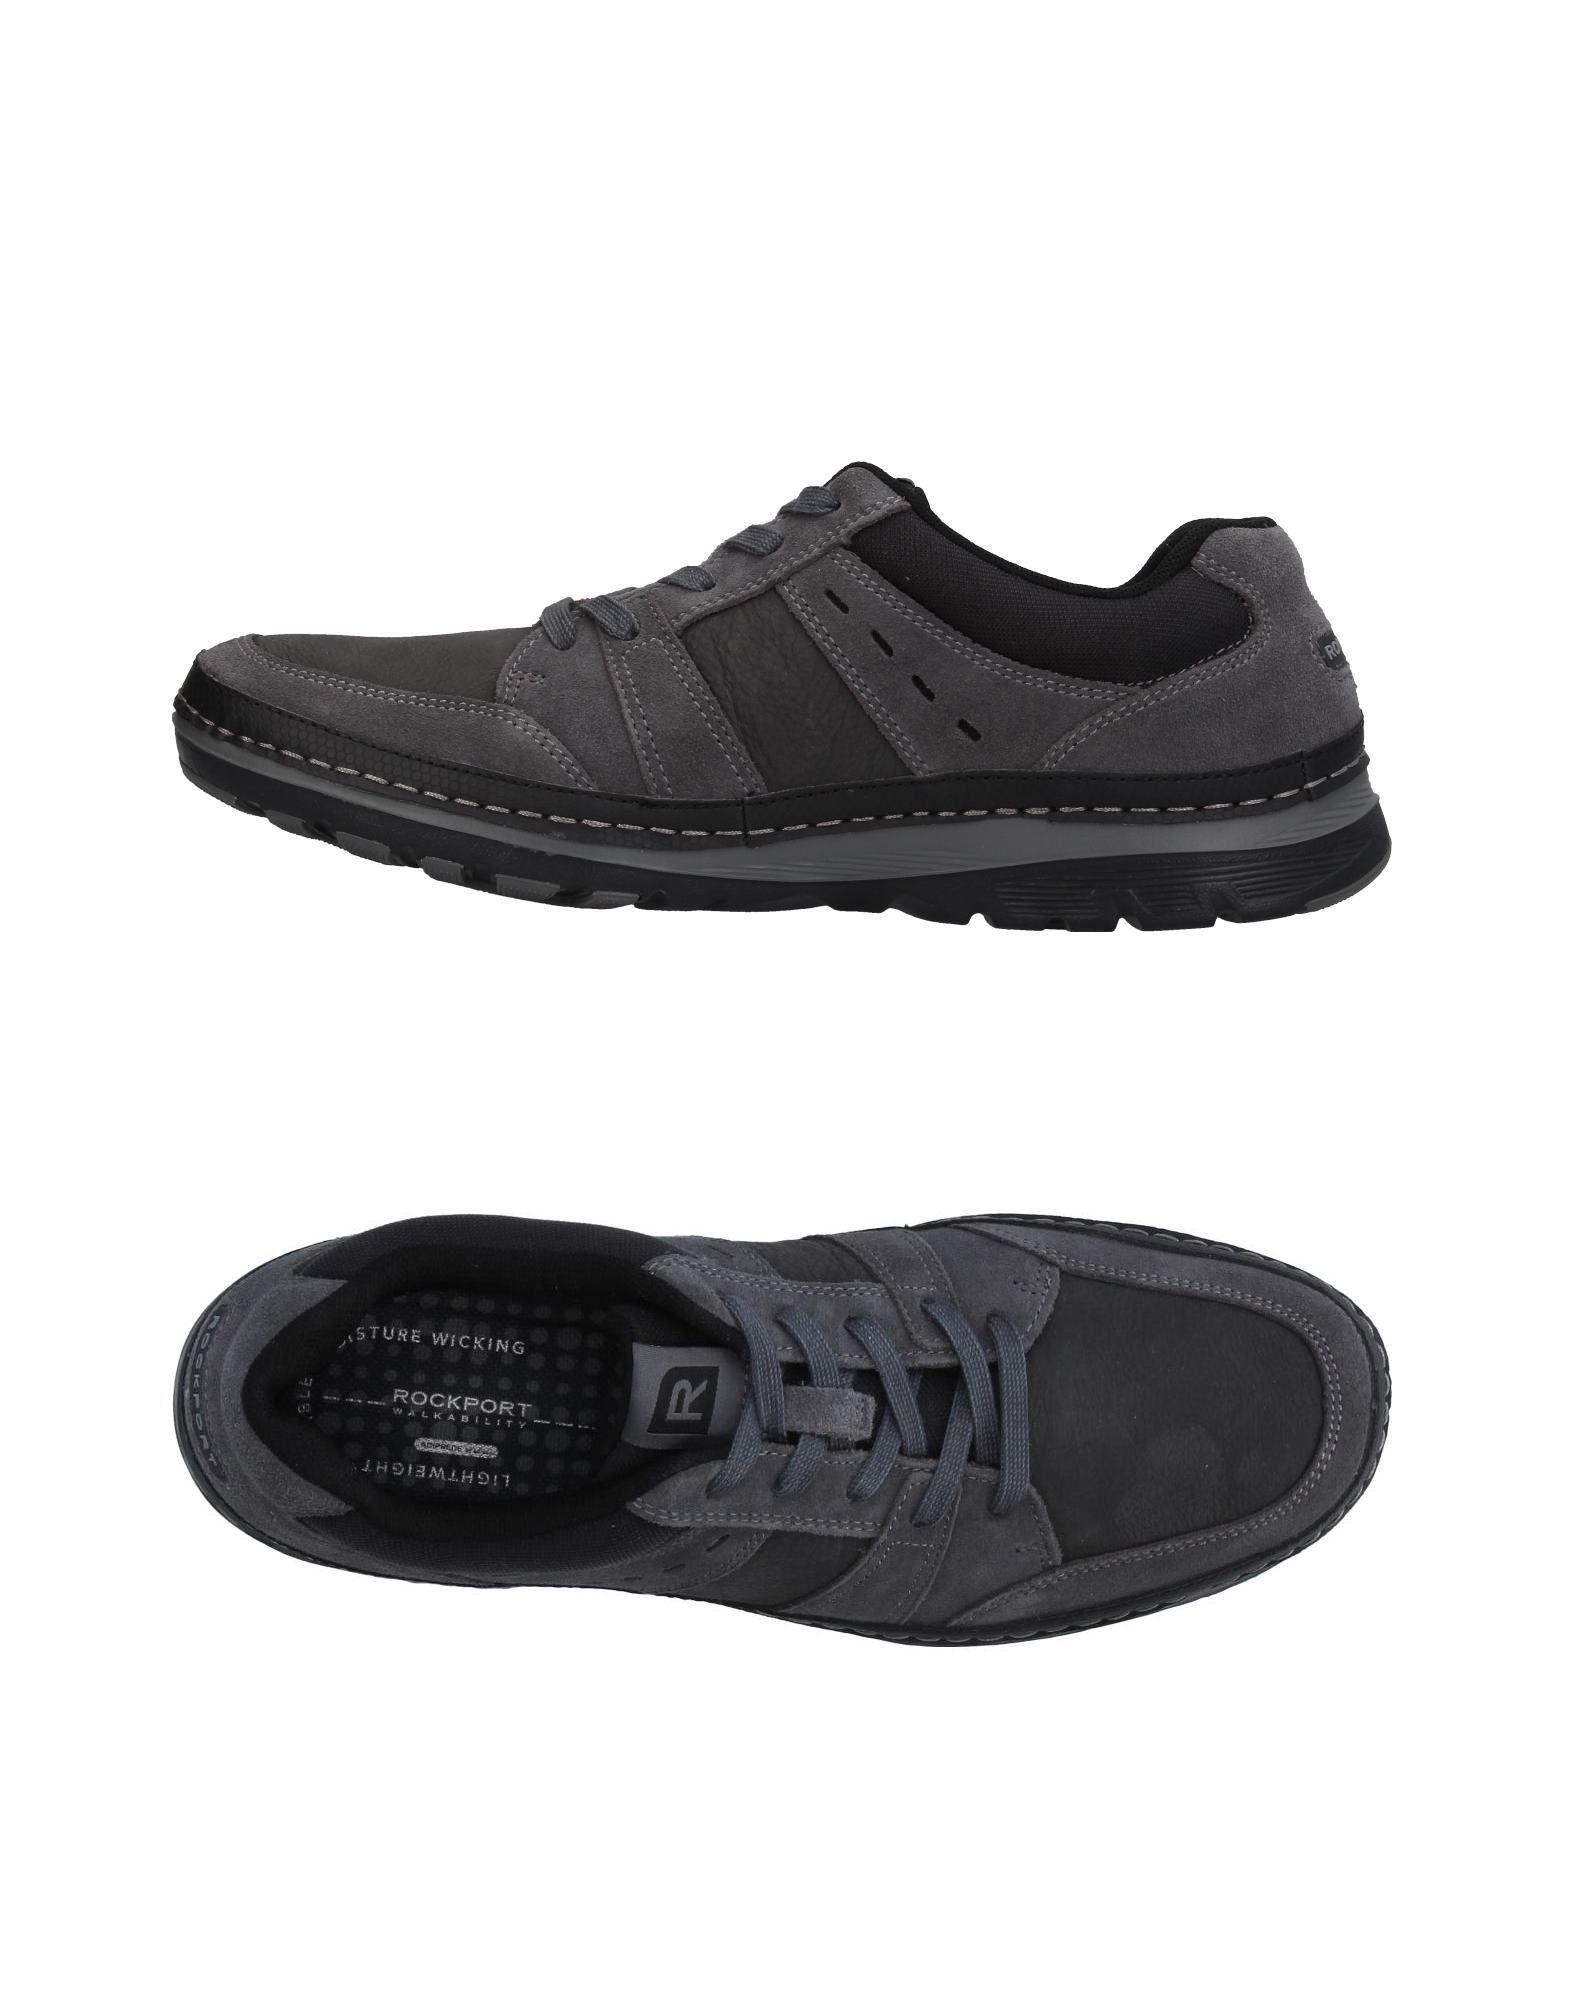 Rockport Sneakers Sneakers Sneakers - Men Rockport Sneakers online on  Australia - 11366268WP 91e5f2